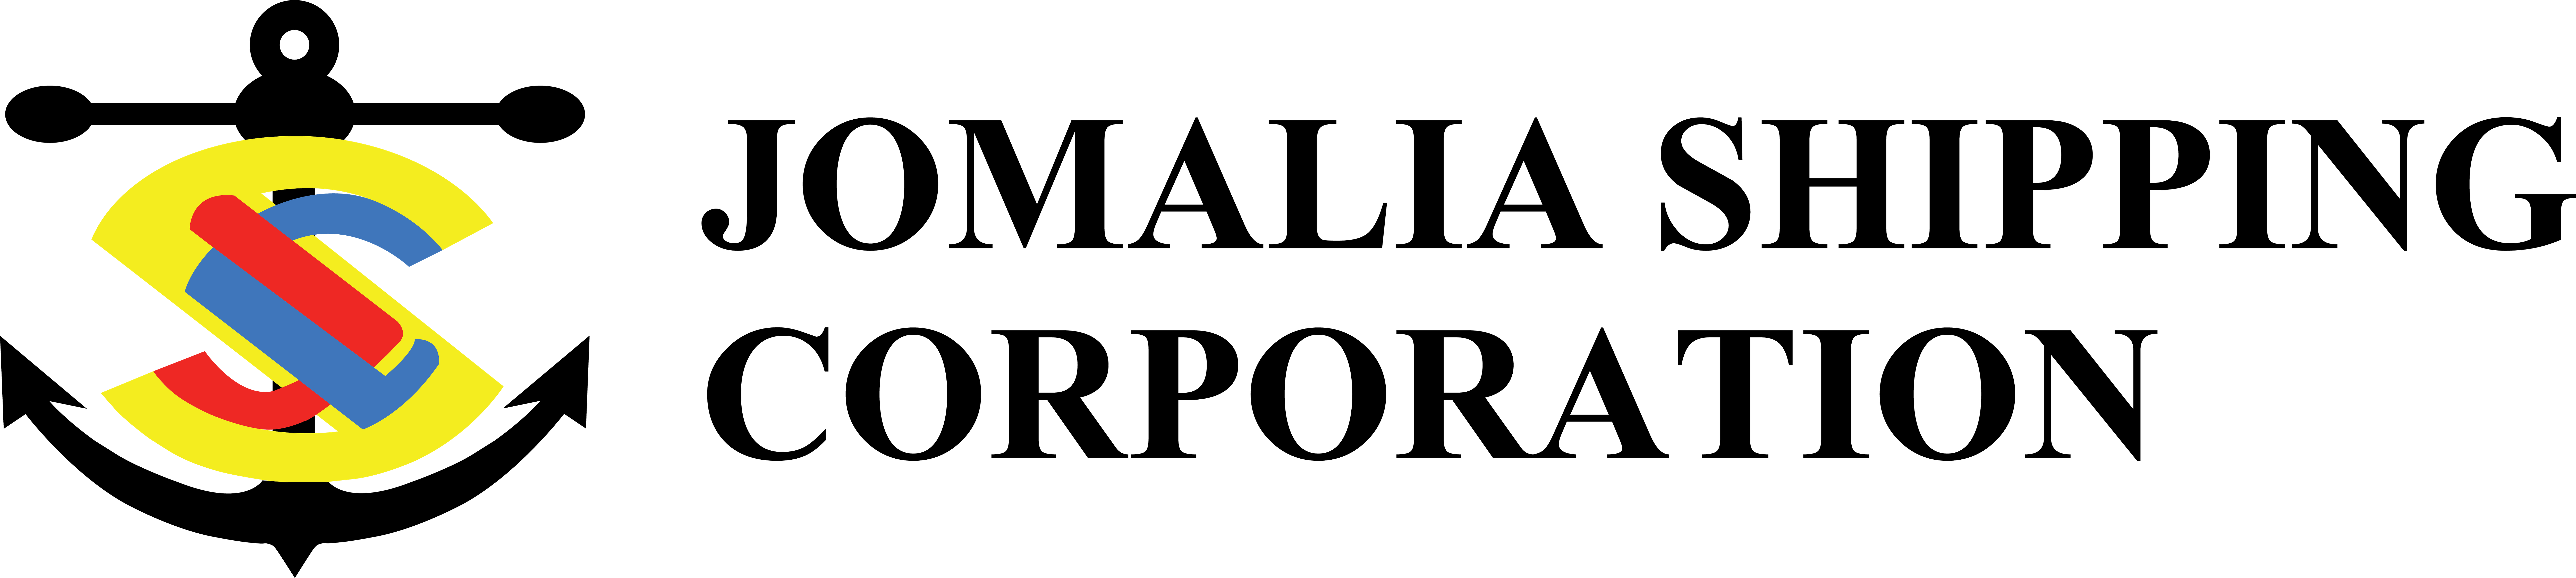 Jomalia Shipping Corporation